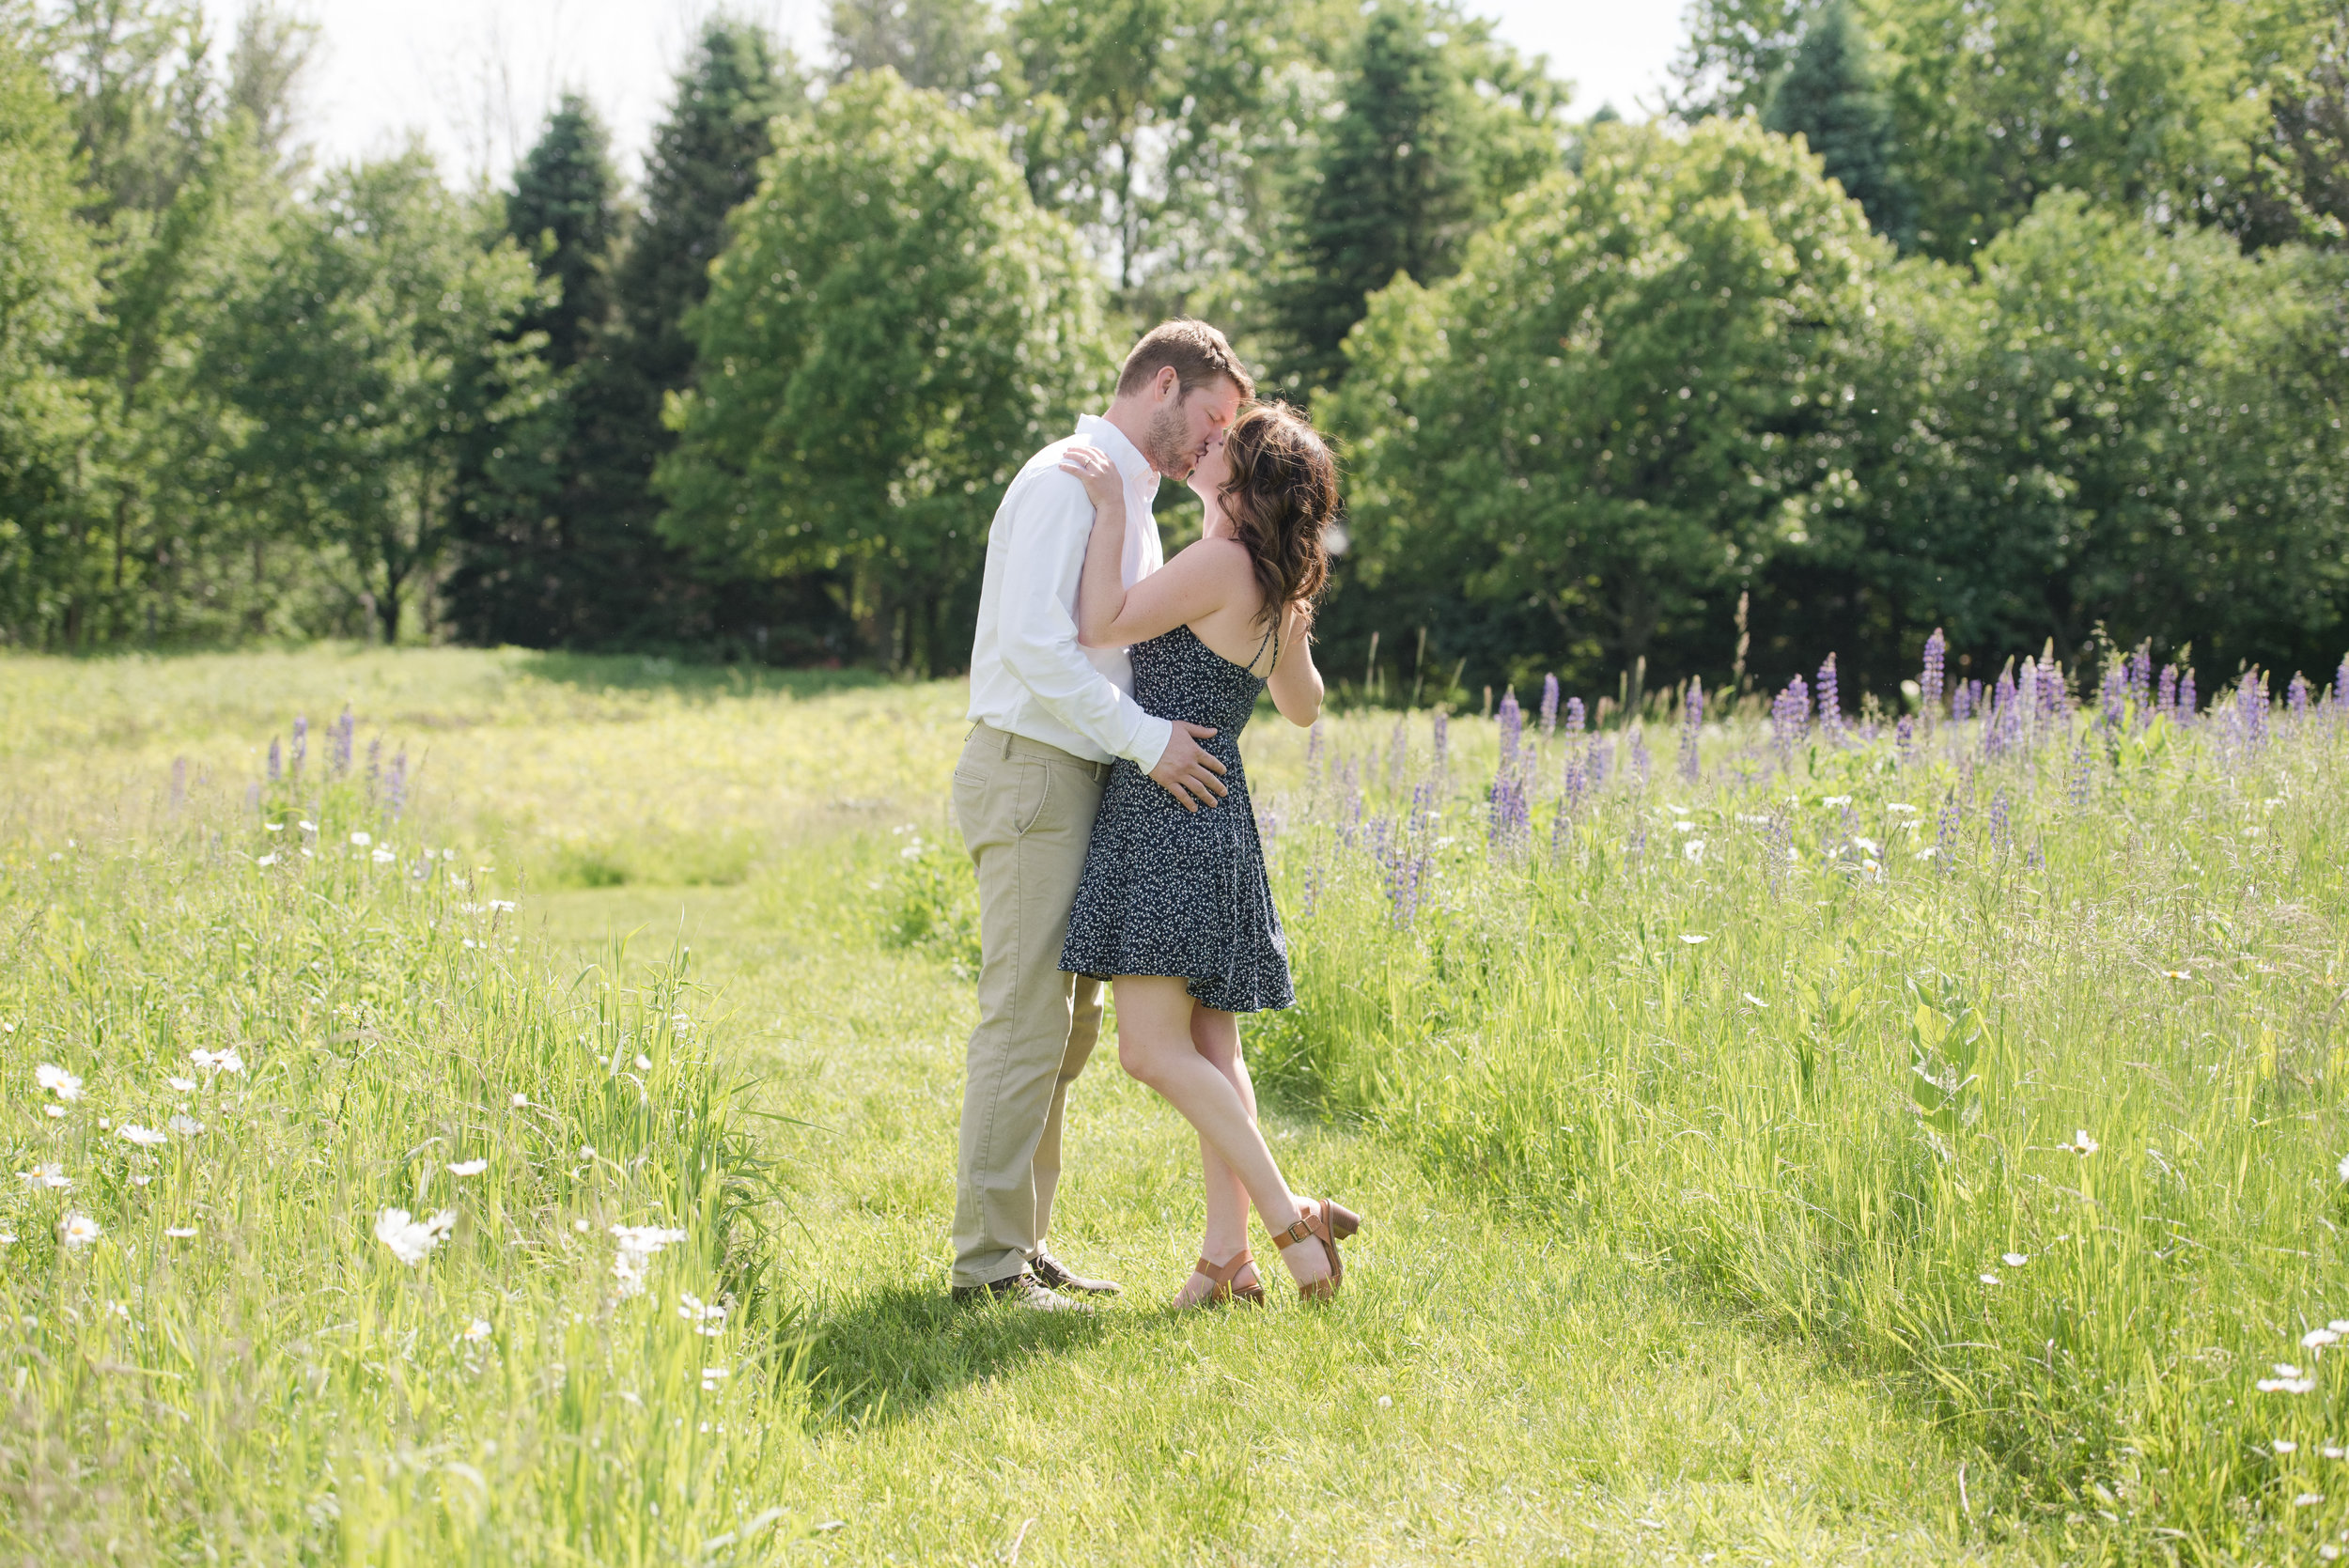 GALLERY-2019-6-9 Kaitlin, Justin & Liam Engagement 0633 85.jpg